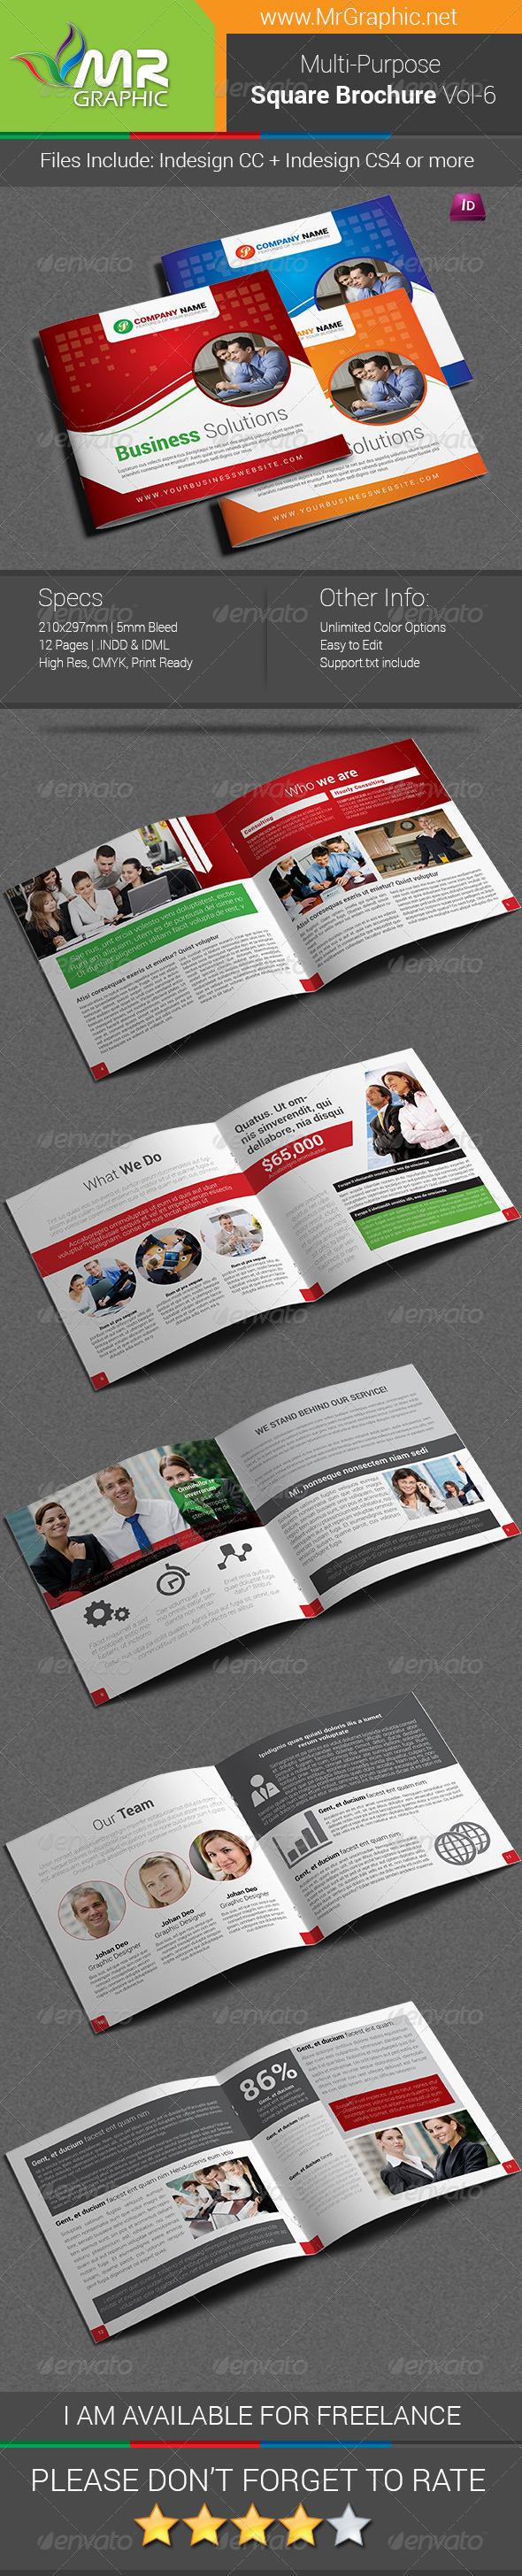 Multipurpose Square Brochure Template Vol-06 - Corporate Brochures